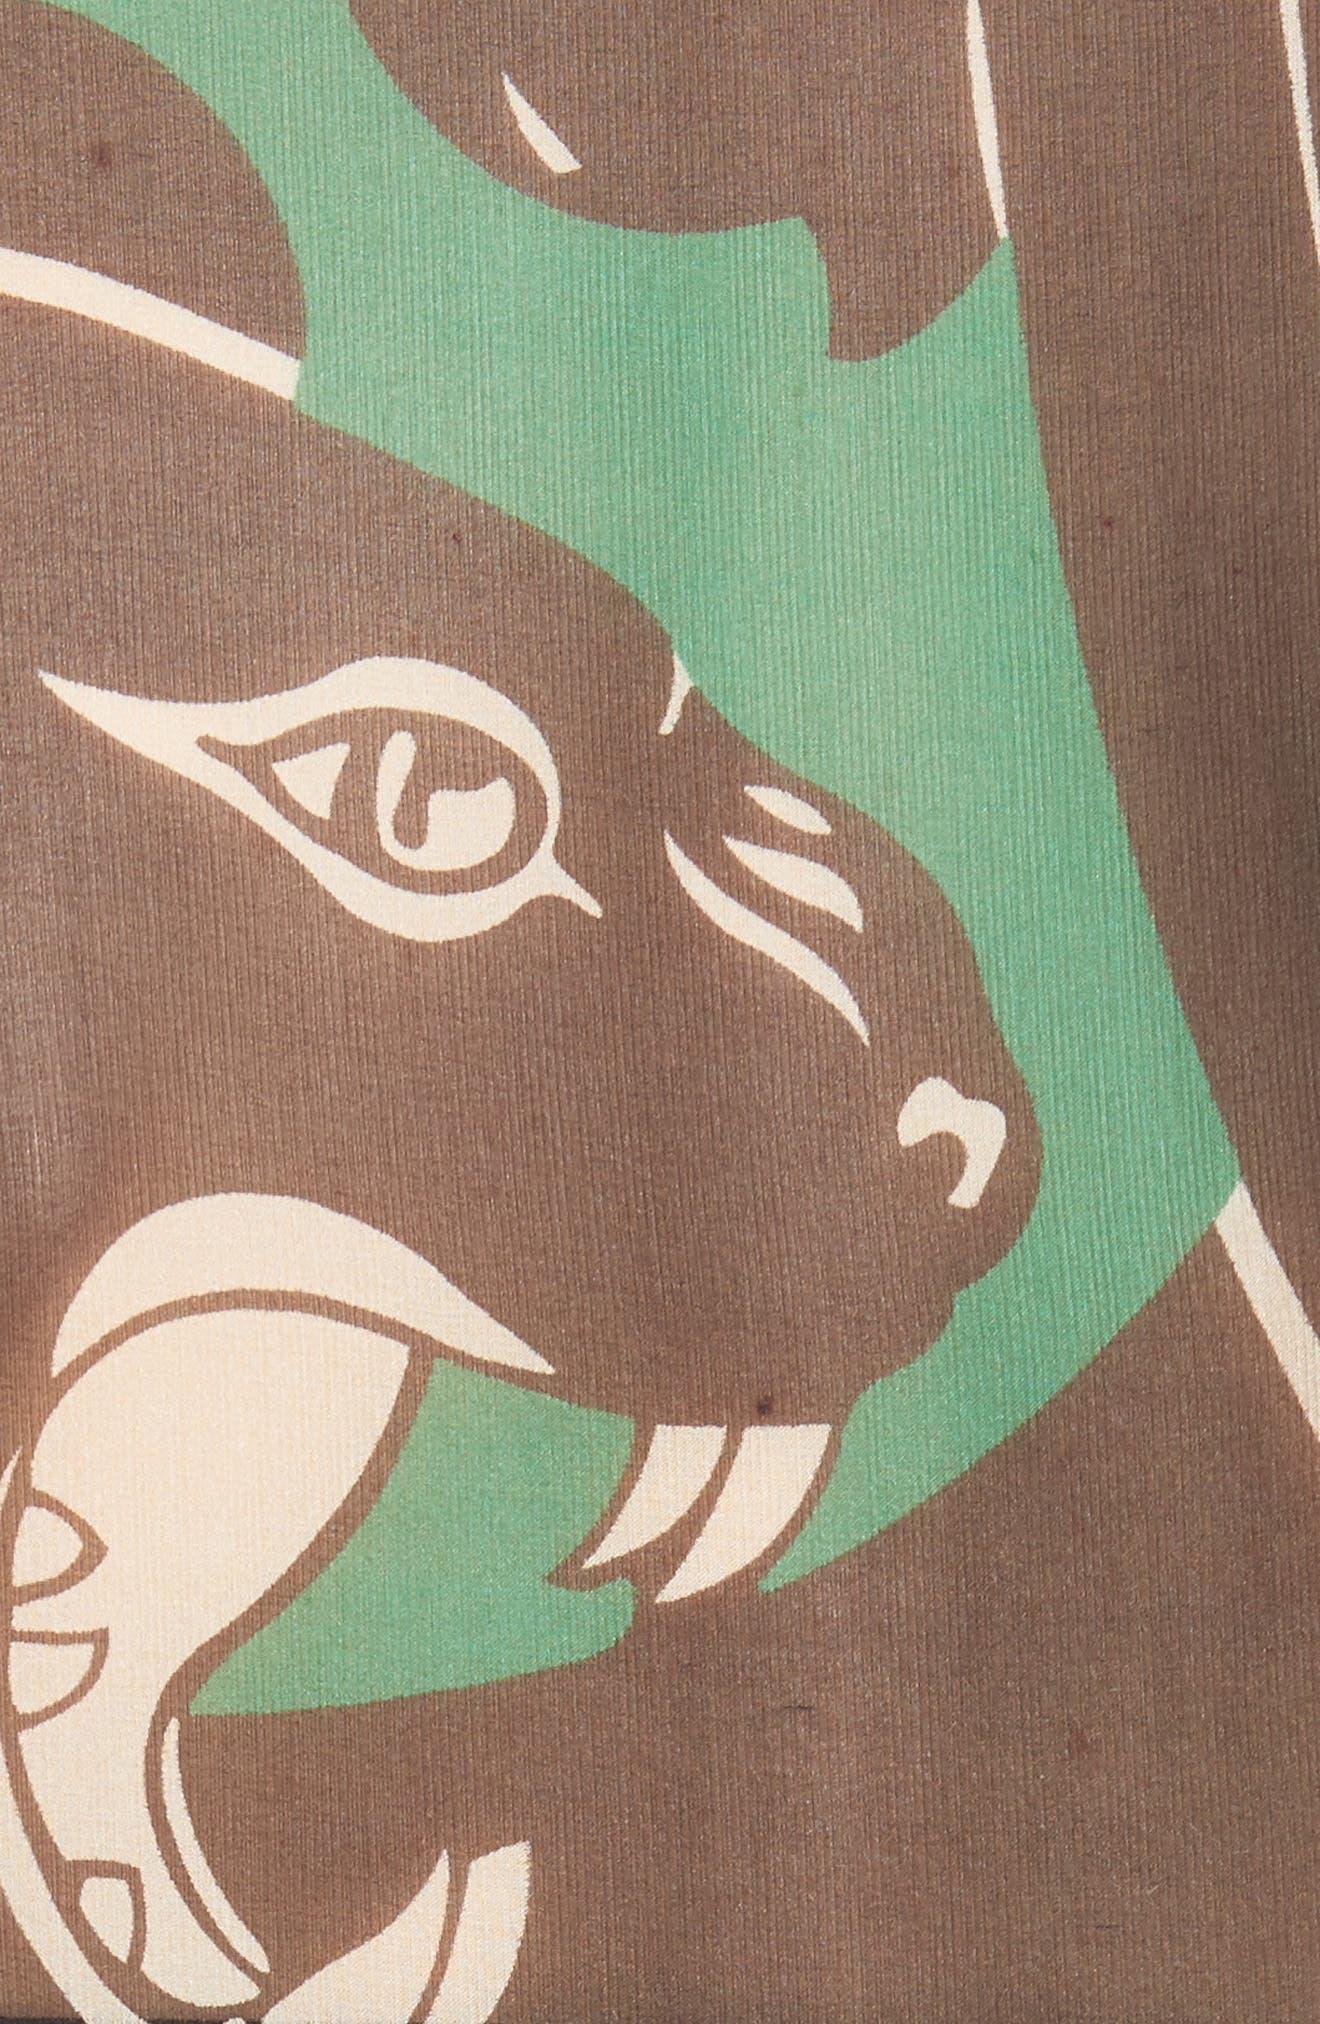 Panther Print Silk Chiffon Blouse,                             Alternate thumbnail 5, color,                             001